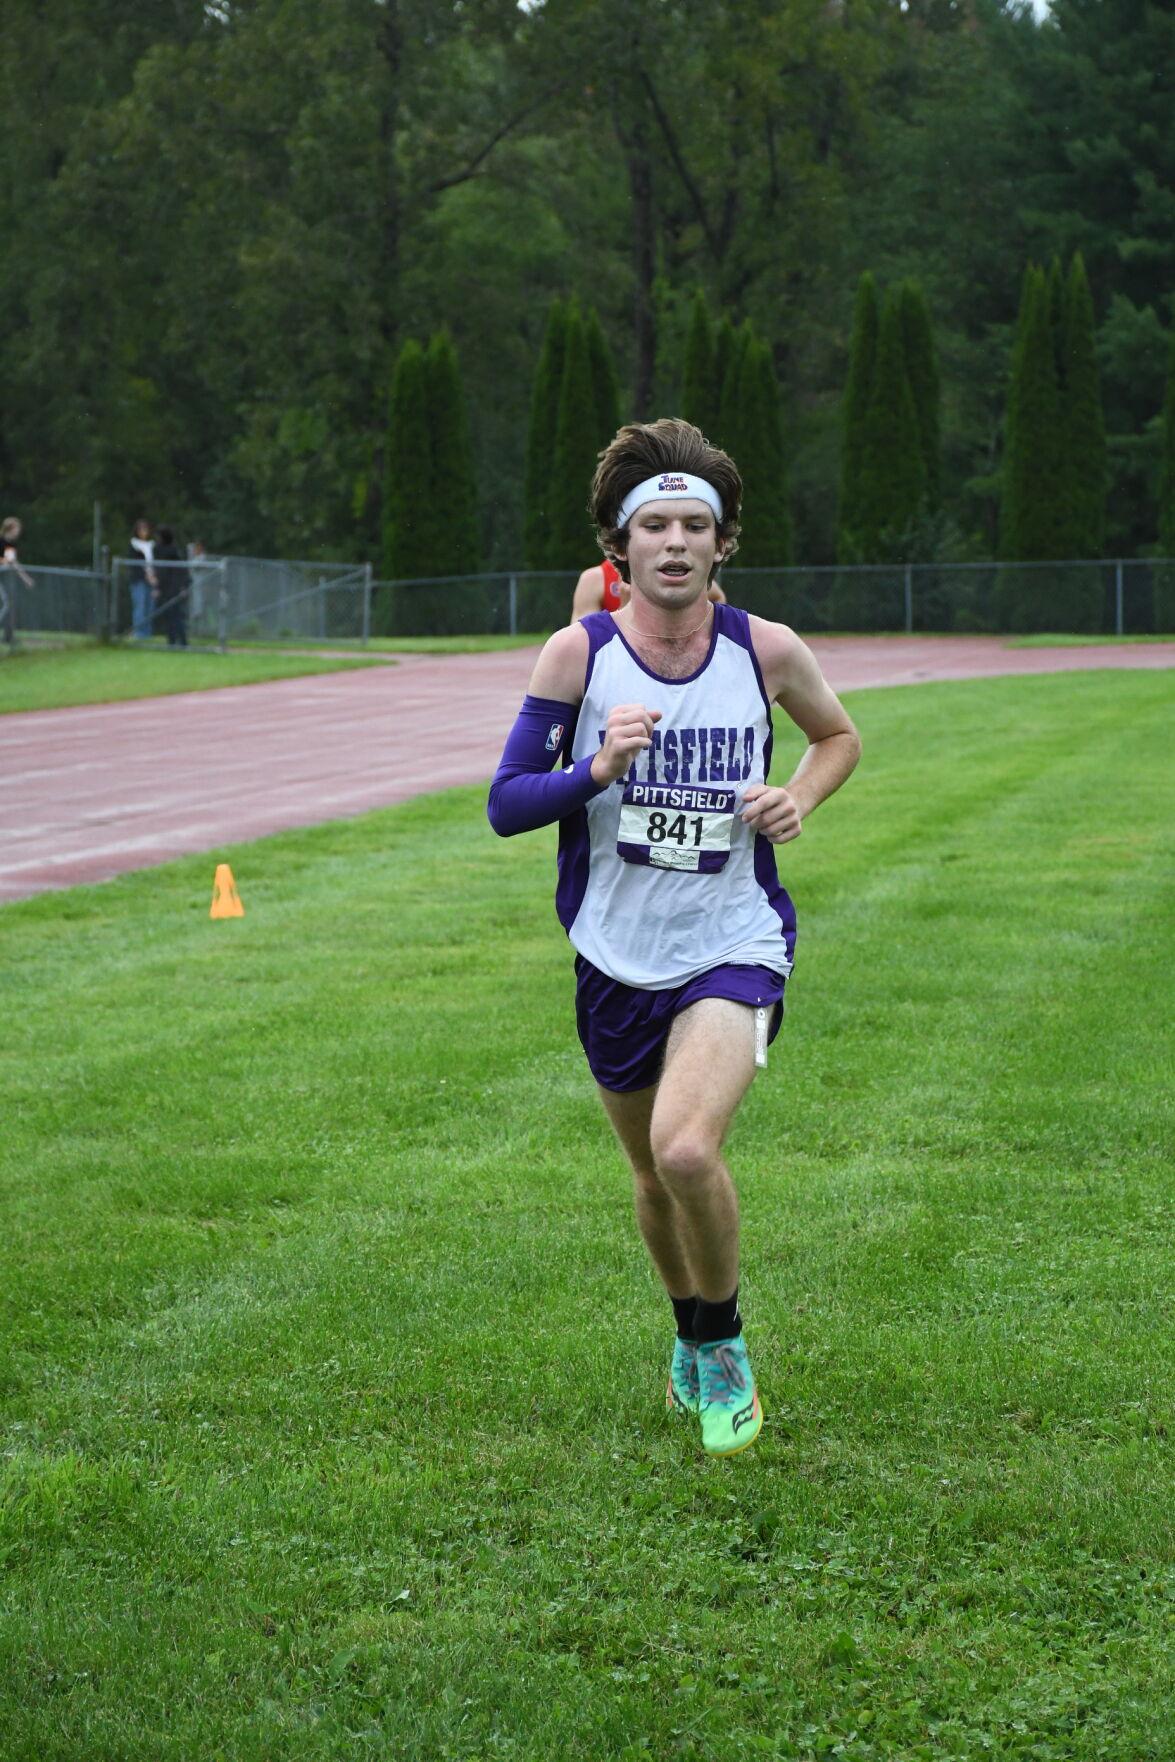 Jack Archey runs